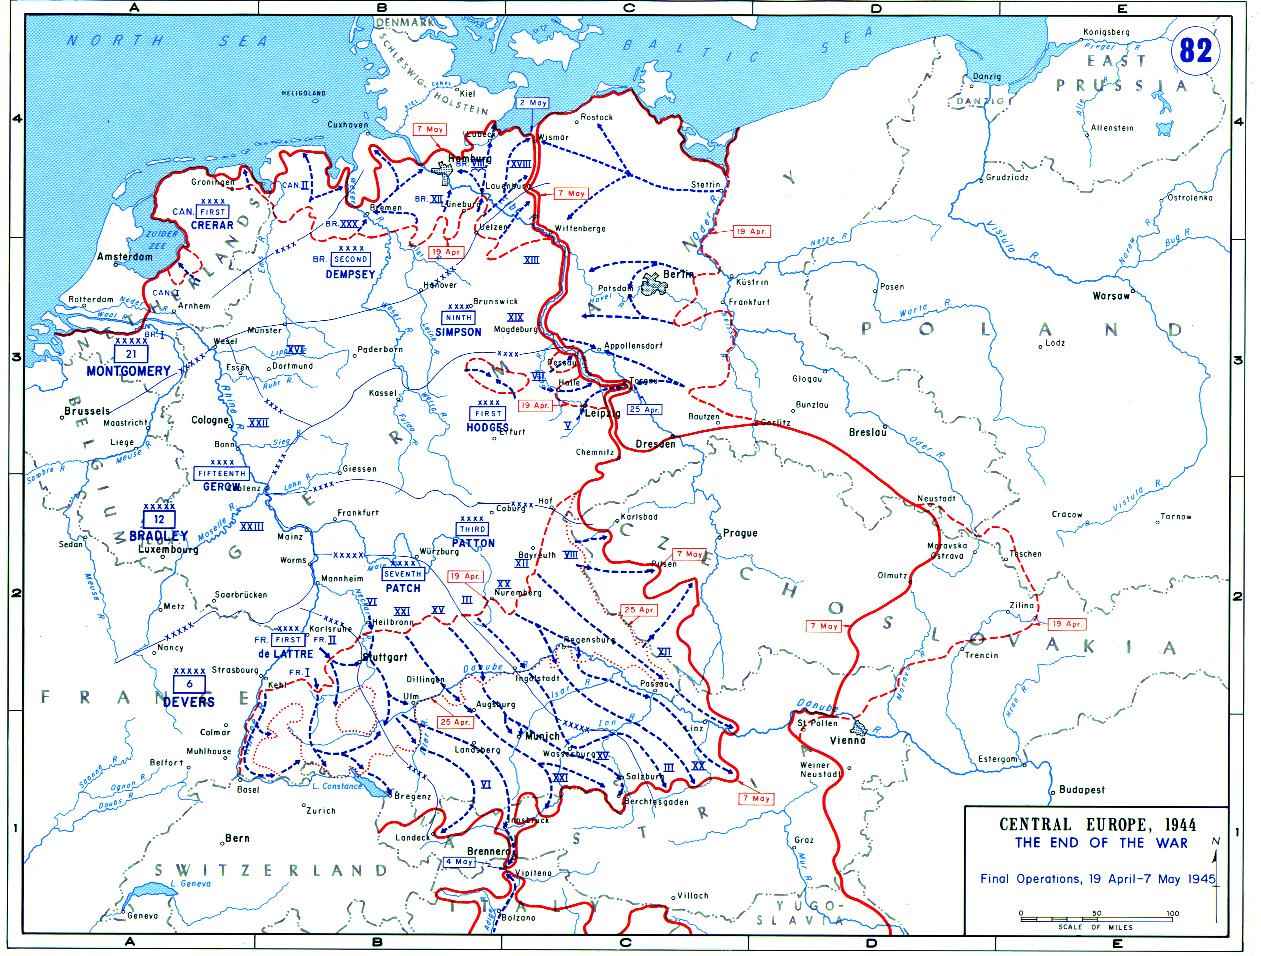 Final_Operations_-_19_April-7_May_1945.jpg